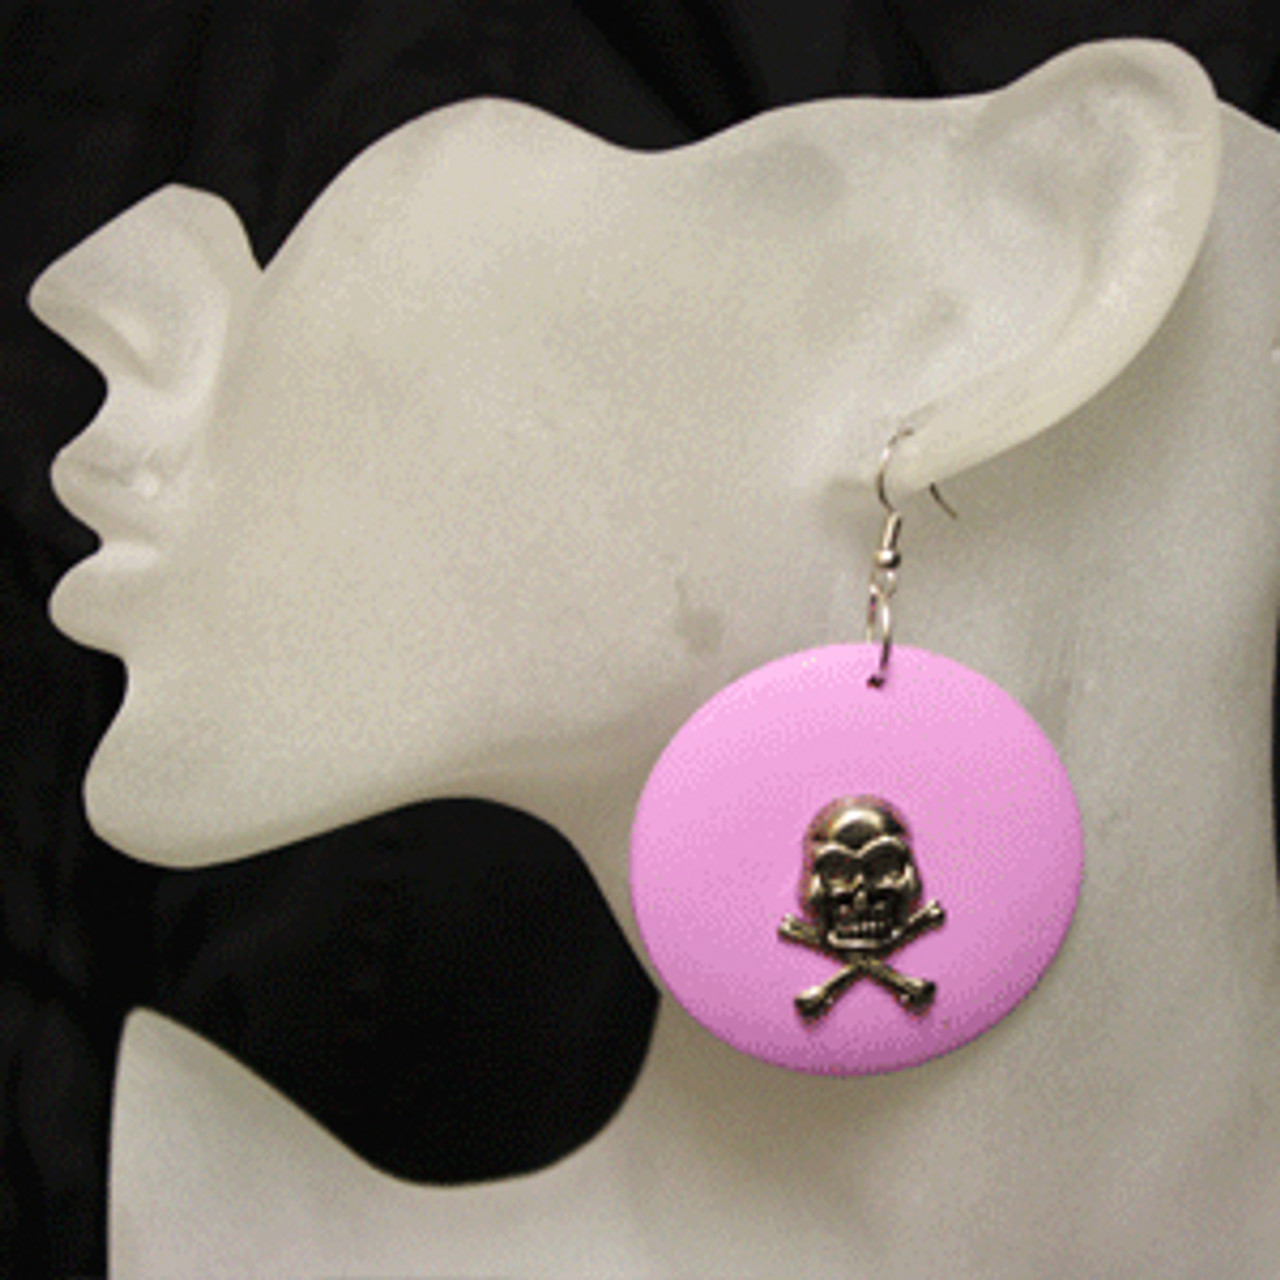 Pink skull rings